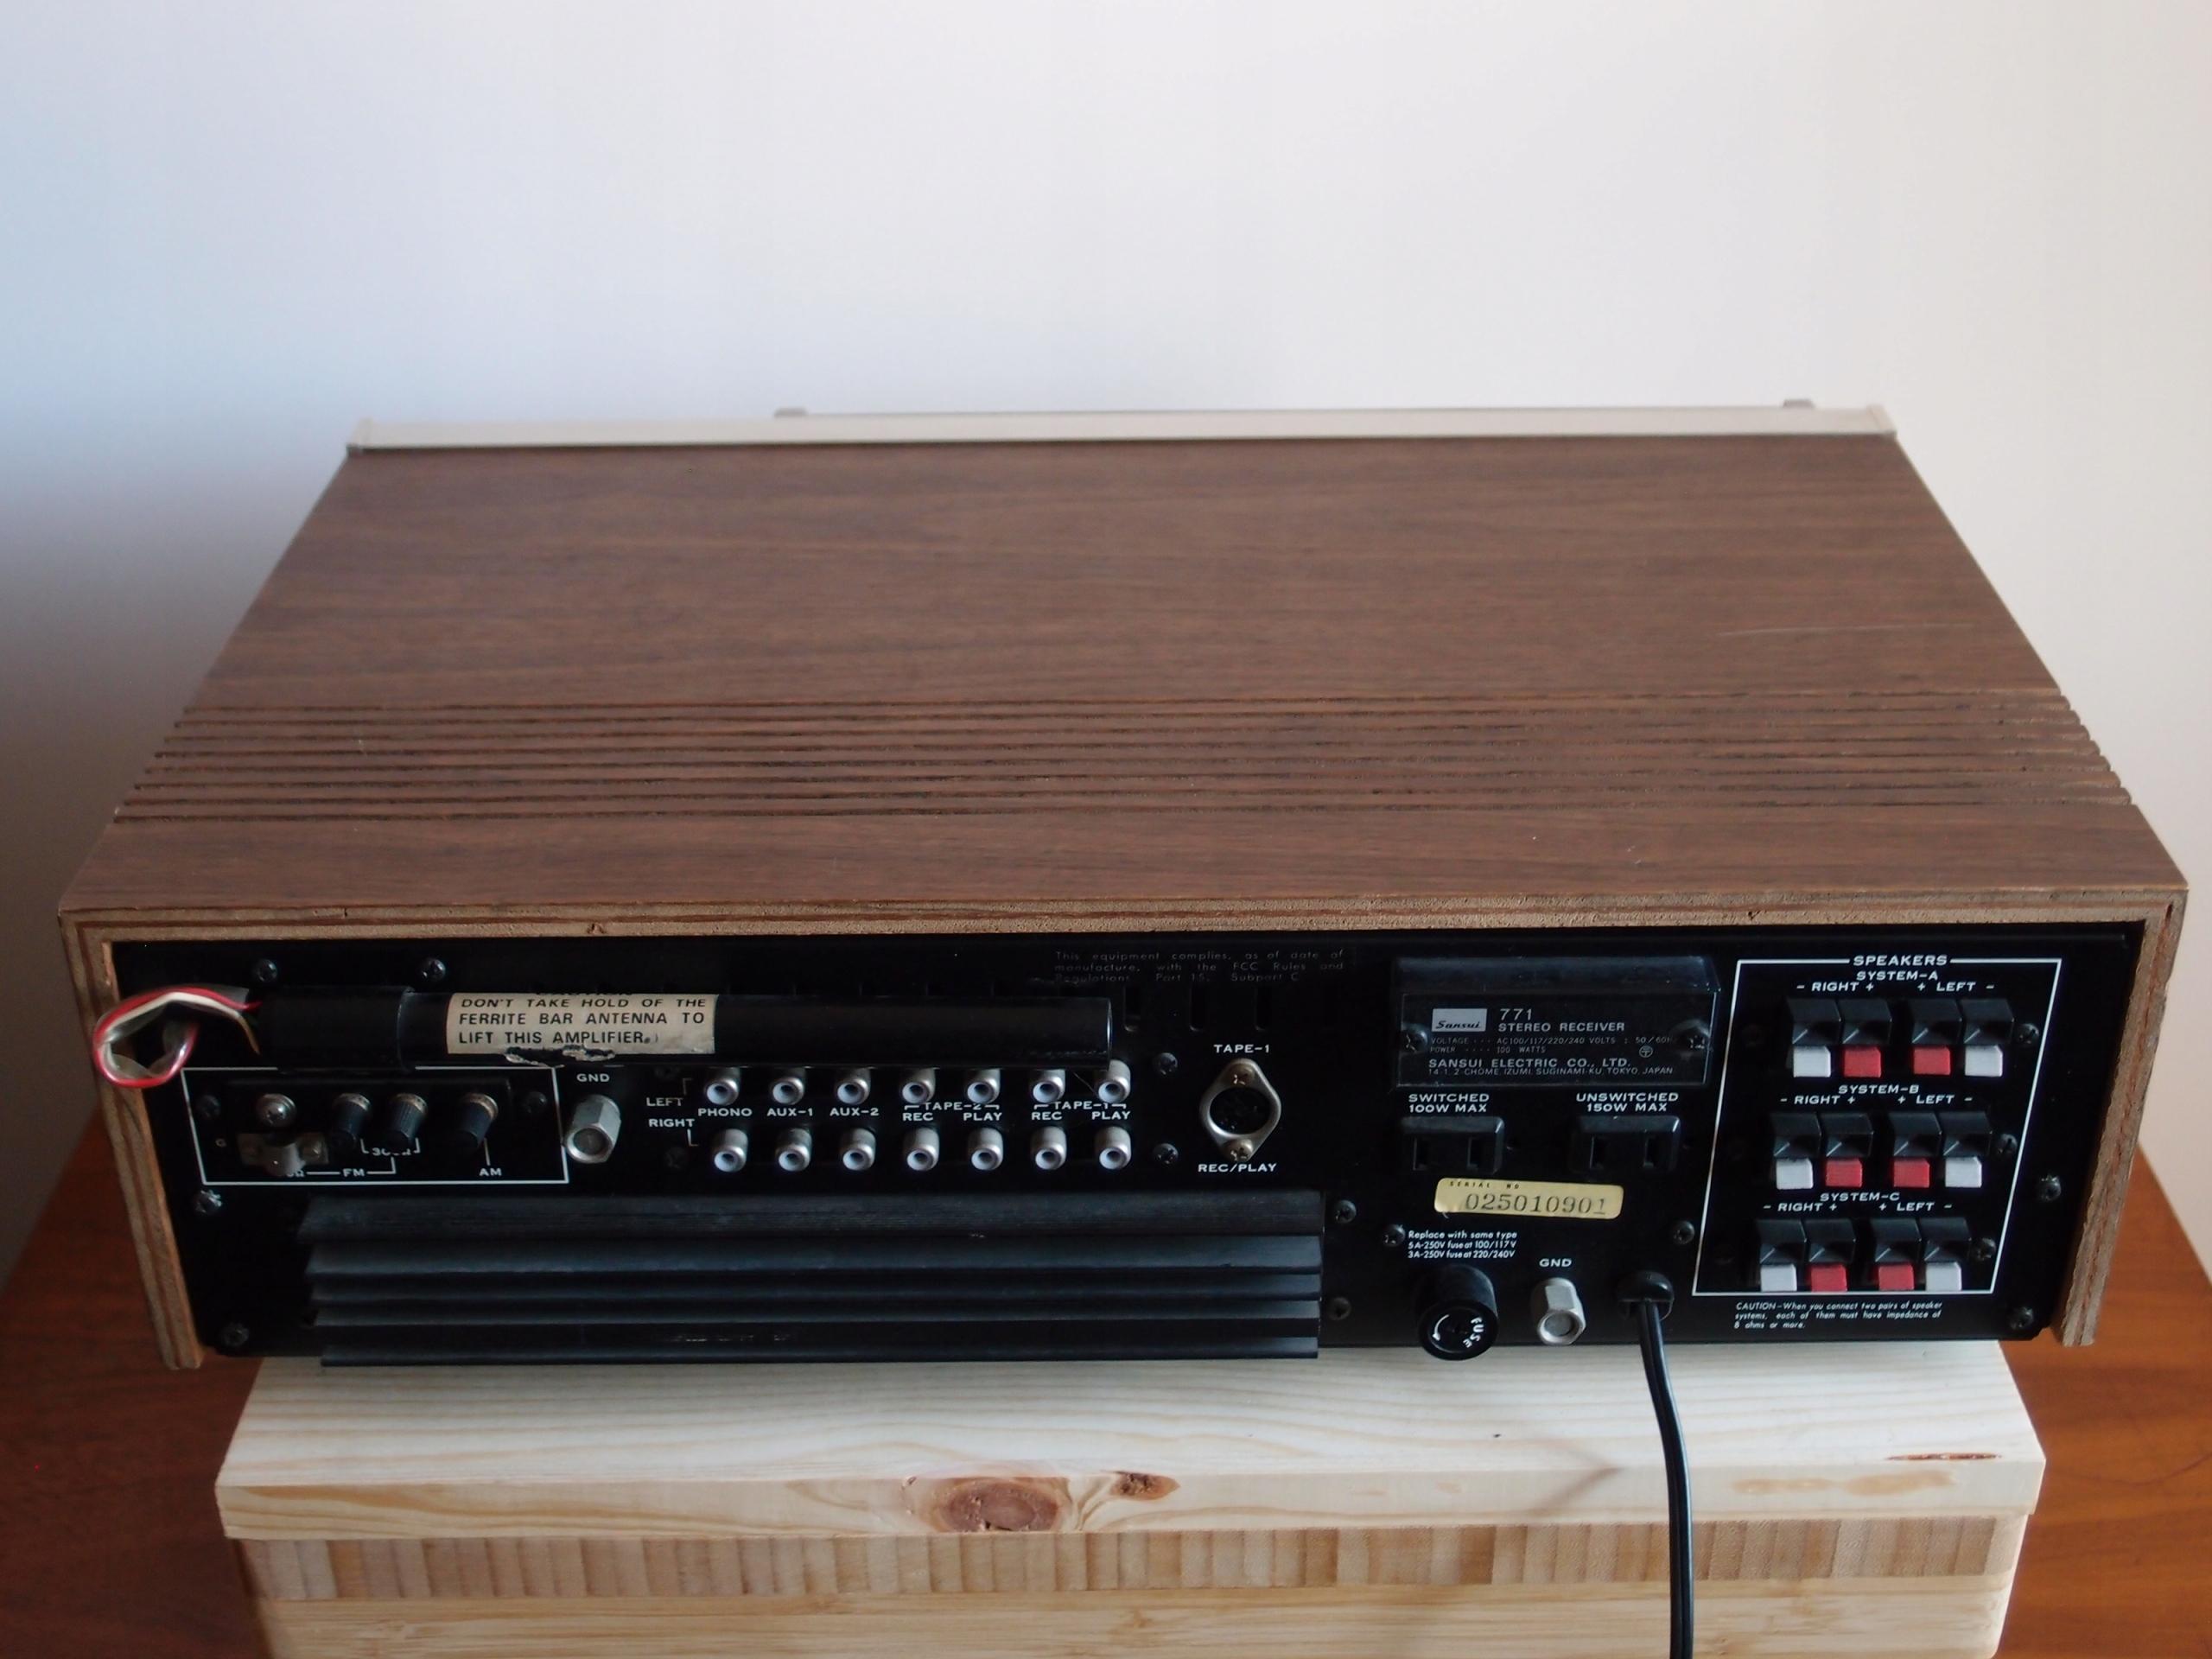 Sansui 771 AM/FM Stereo Receiver - 7616008748 - oficjalne archiwum